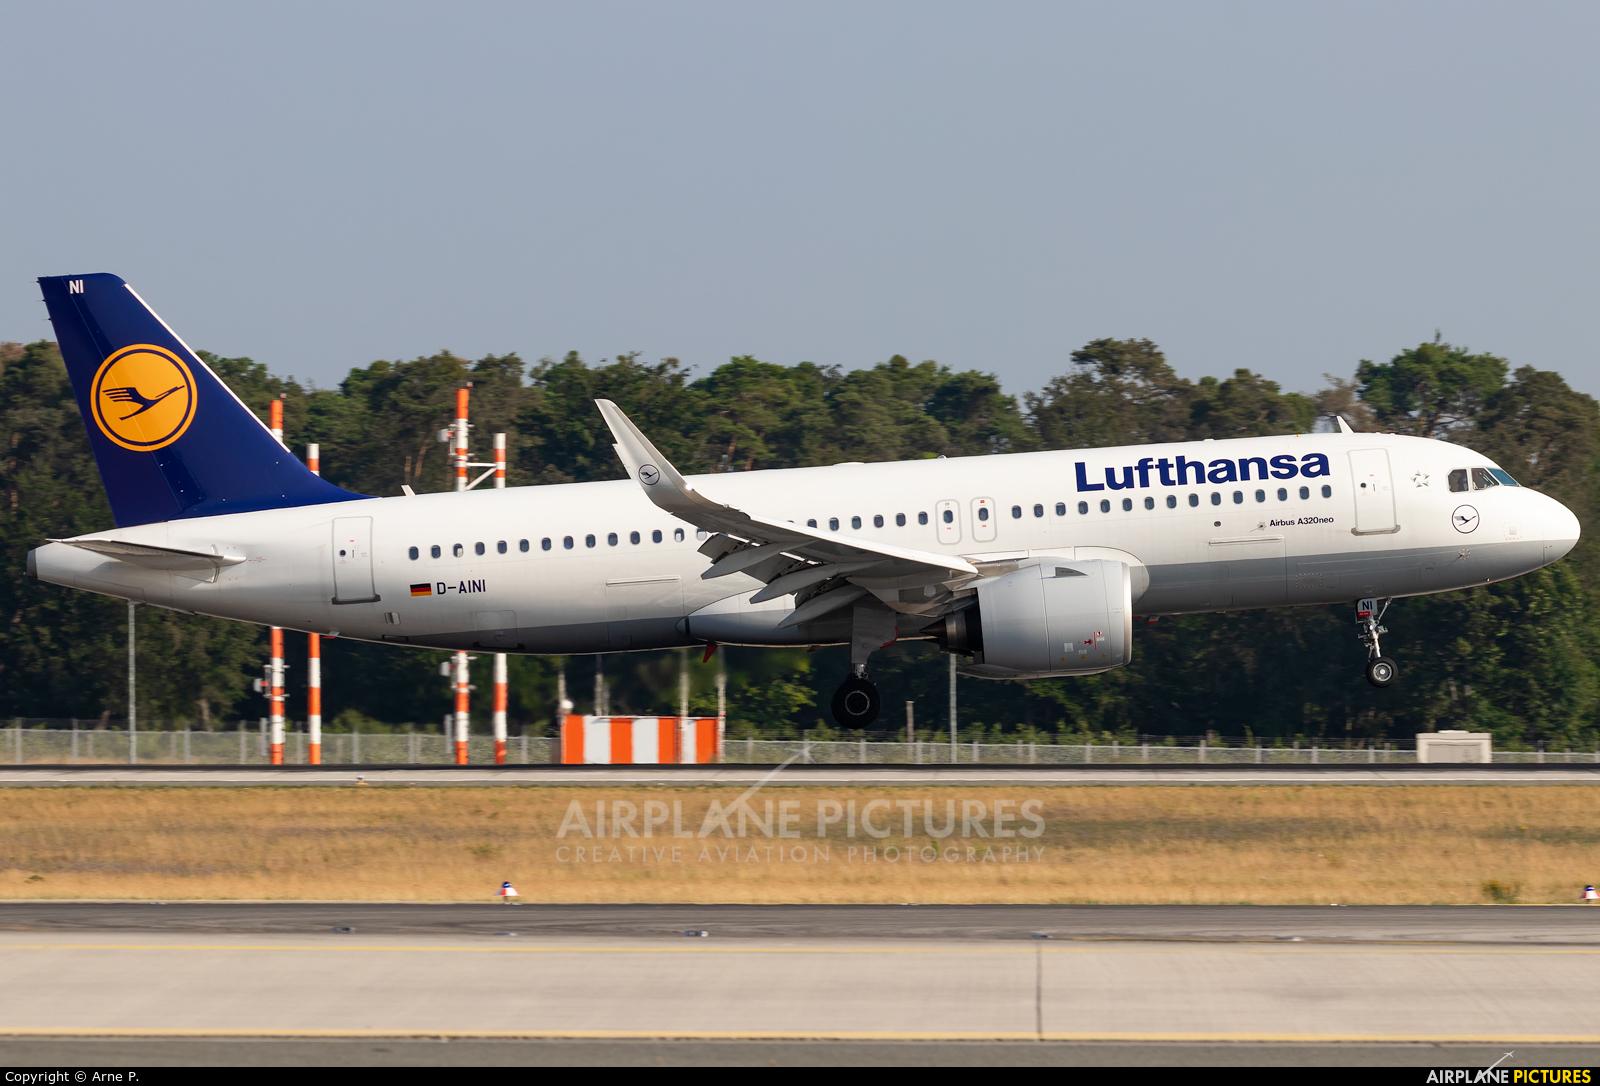 Lufthansa D-AINI aircraft at Frankfurt